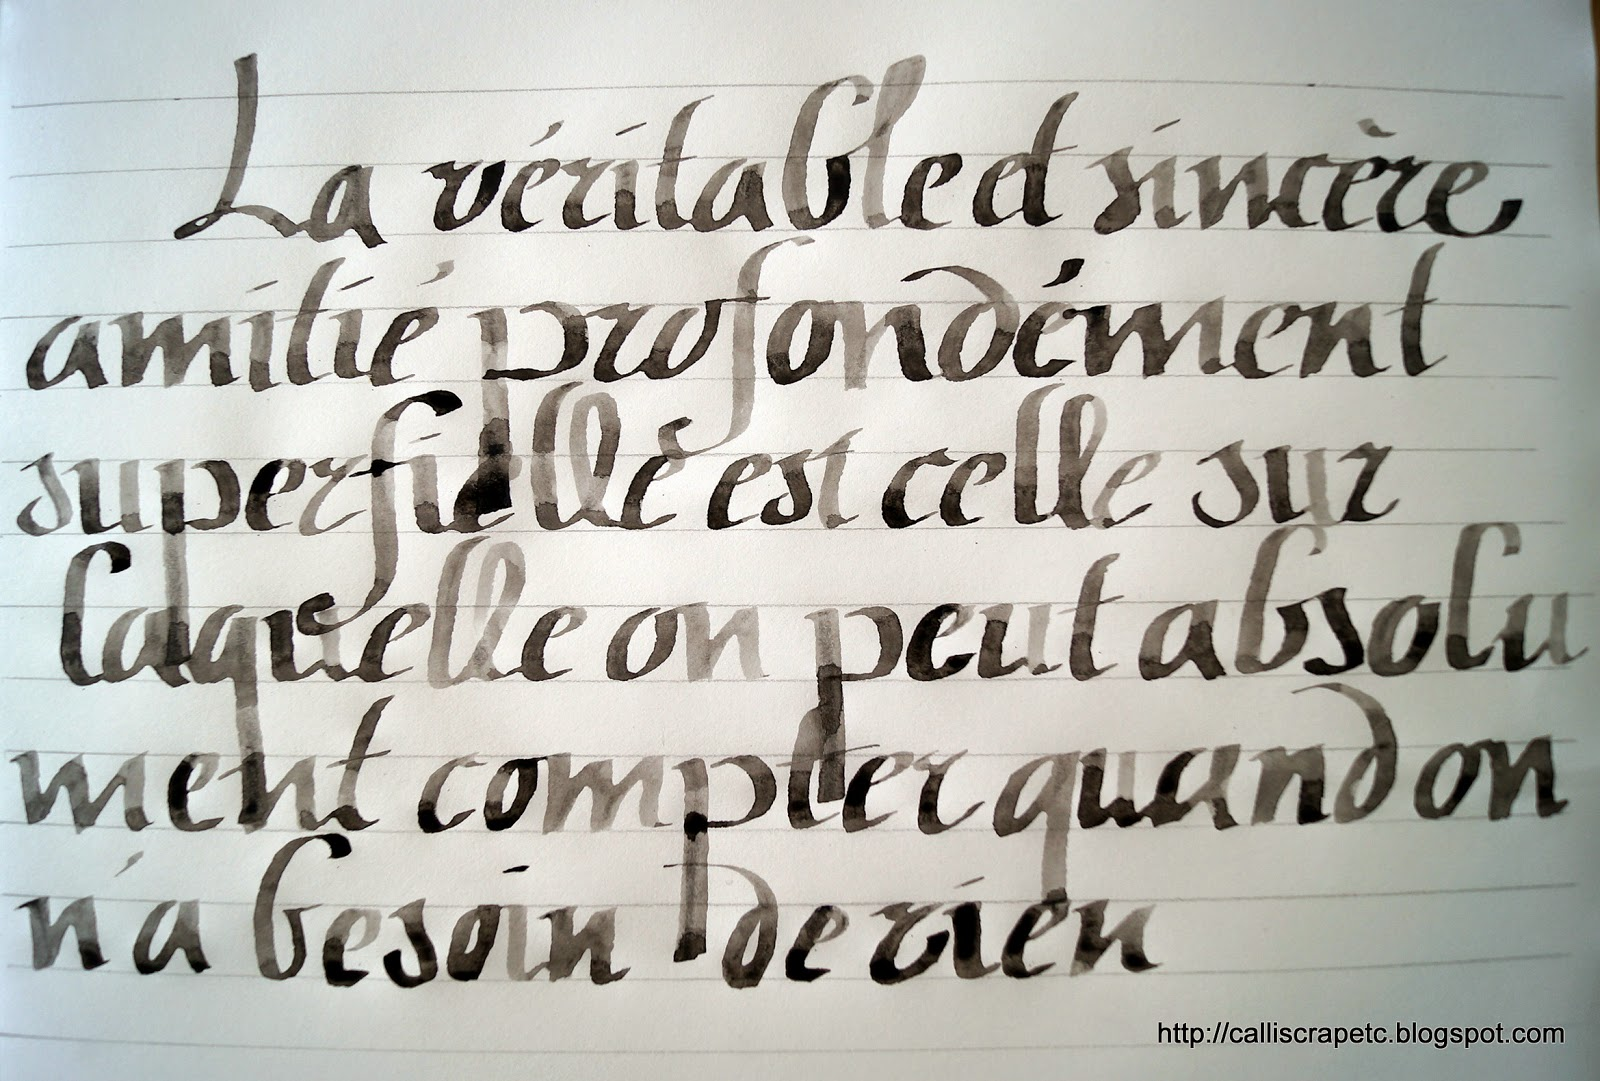 Natcalli Calligraphie & Illustration - Modele Calligraphie Tatouage